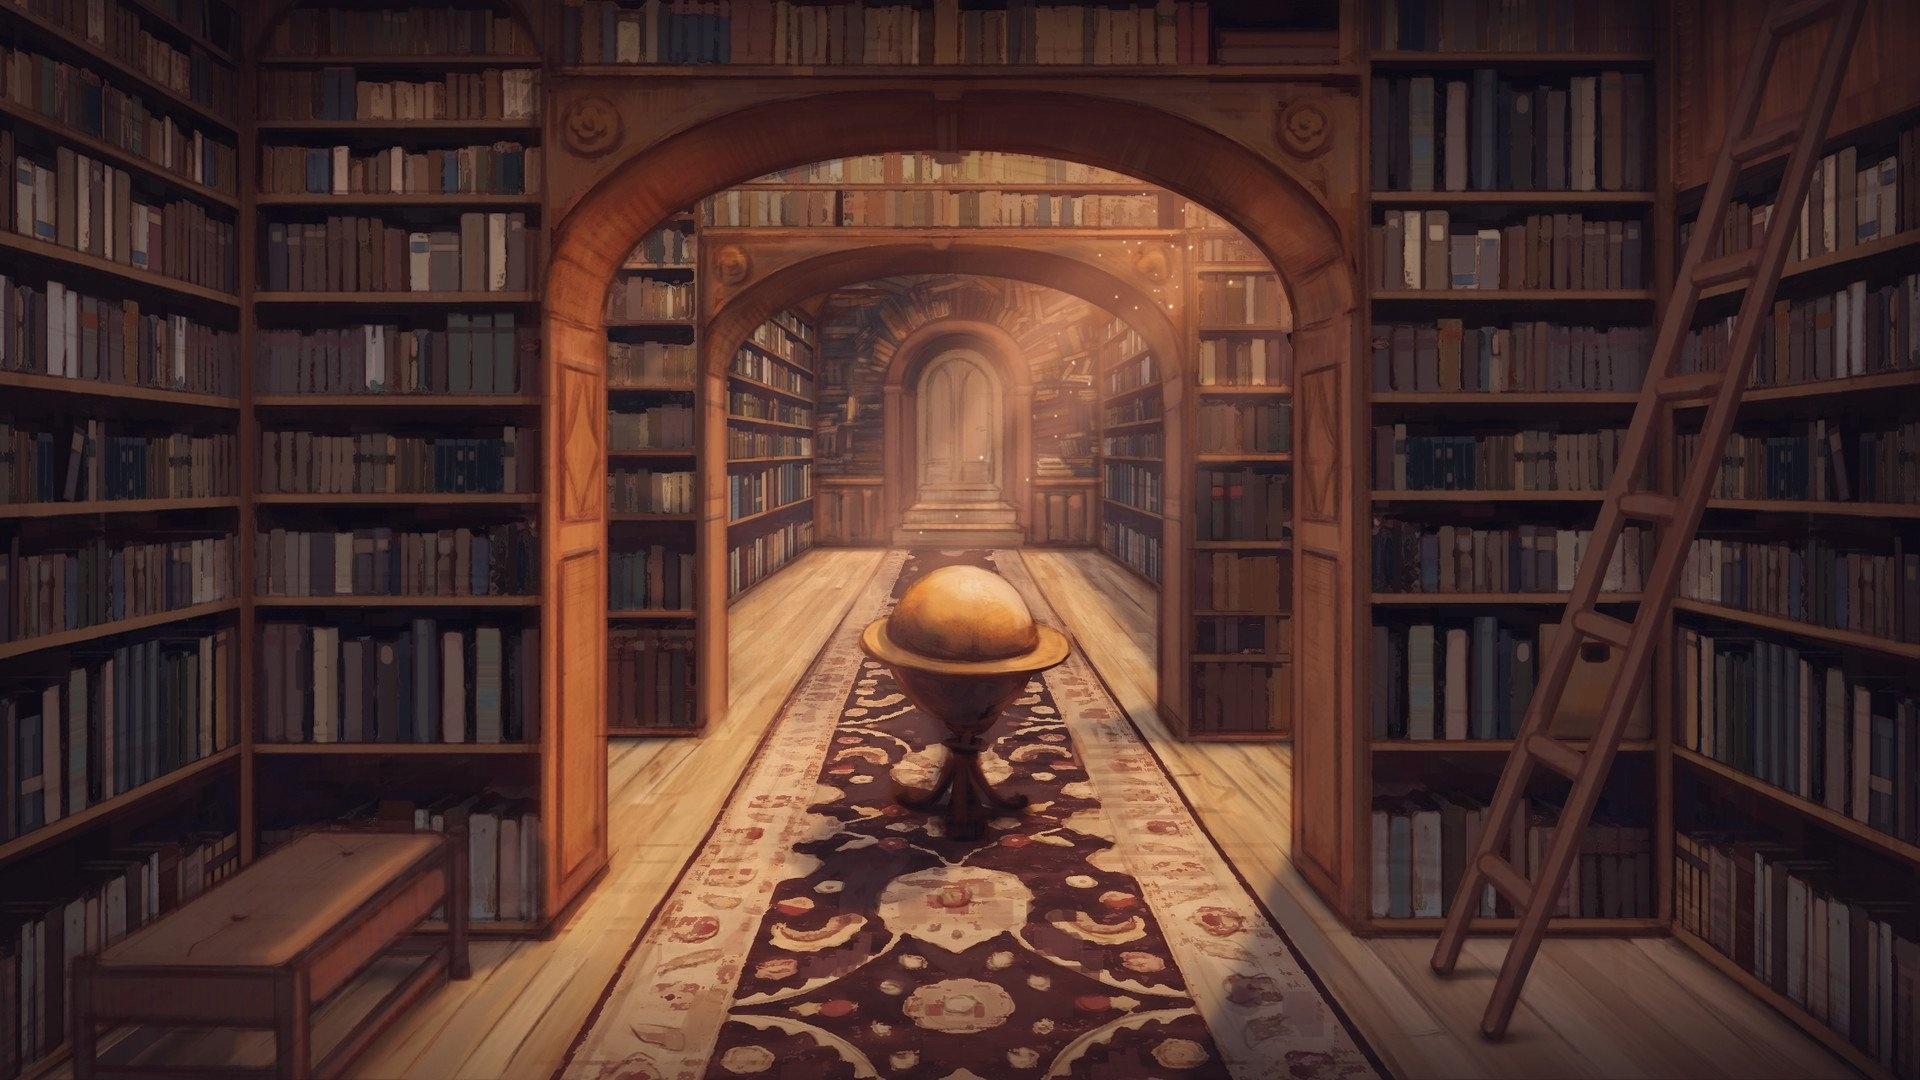 Library Wallpaper image hd